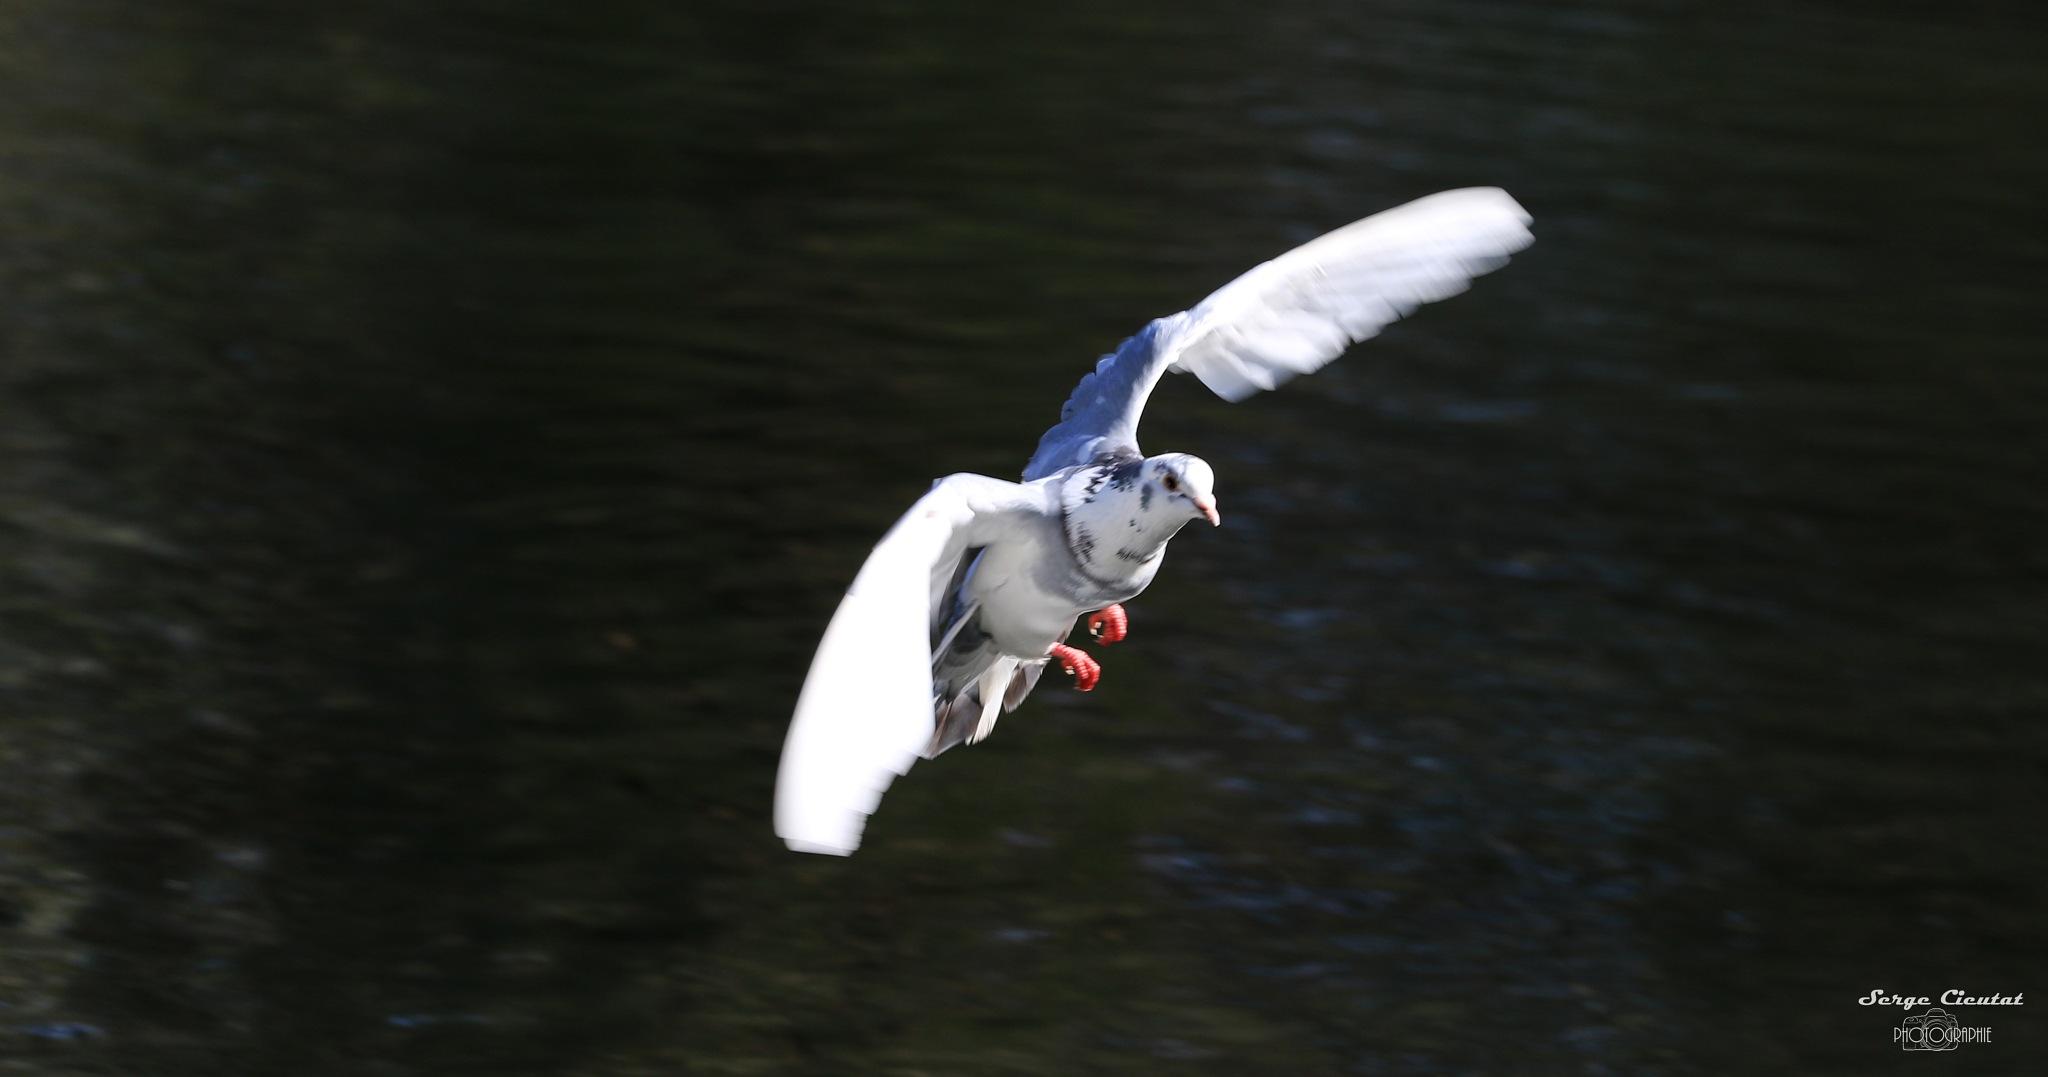 atterrissage by Cieutat serge